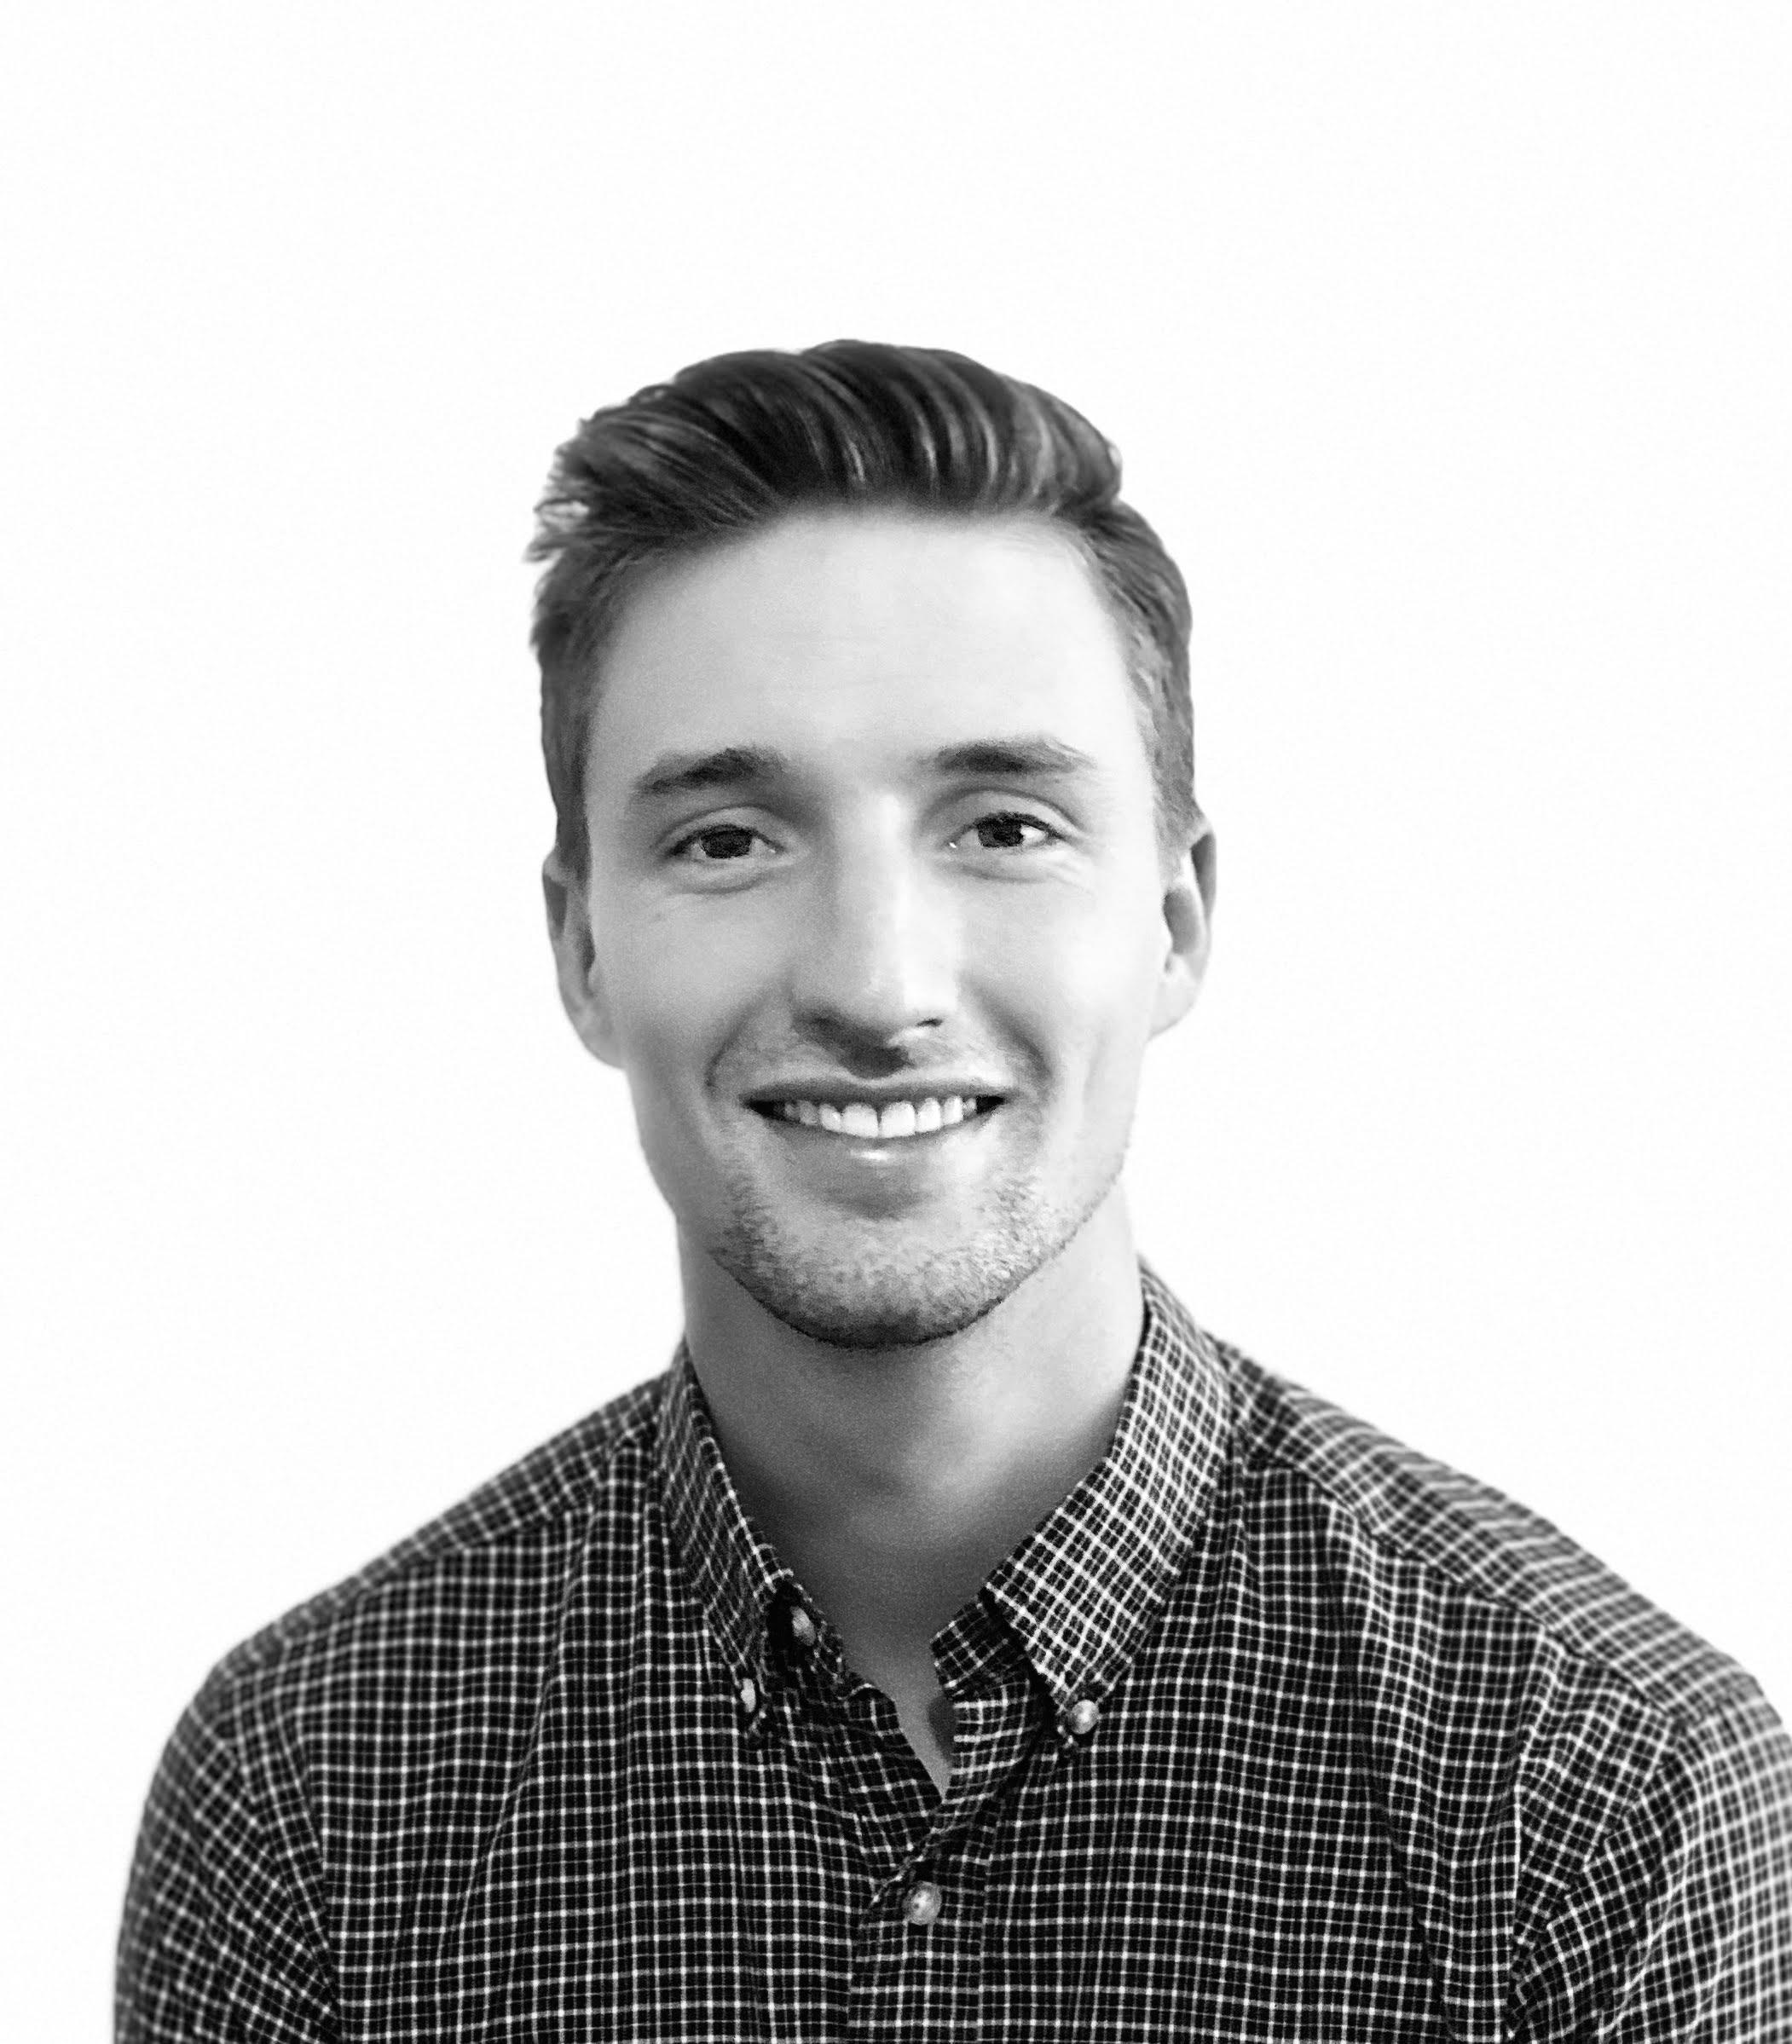 Joshua Concannon - Director of Marketing